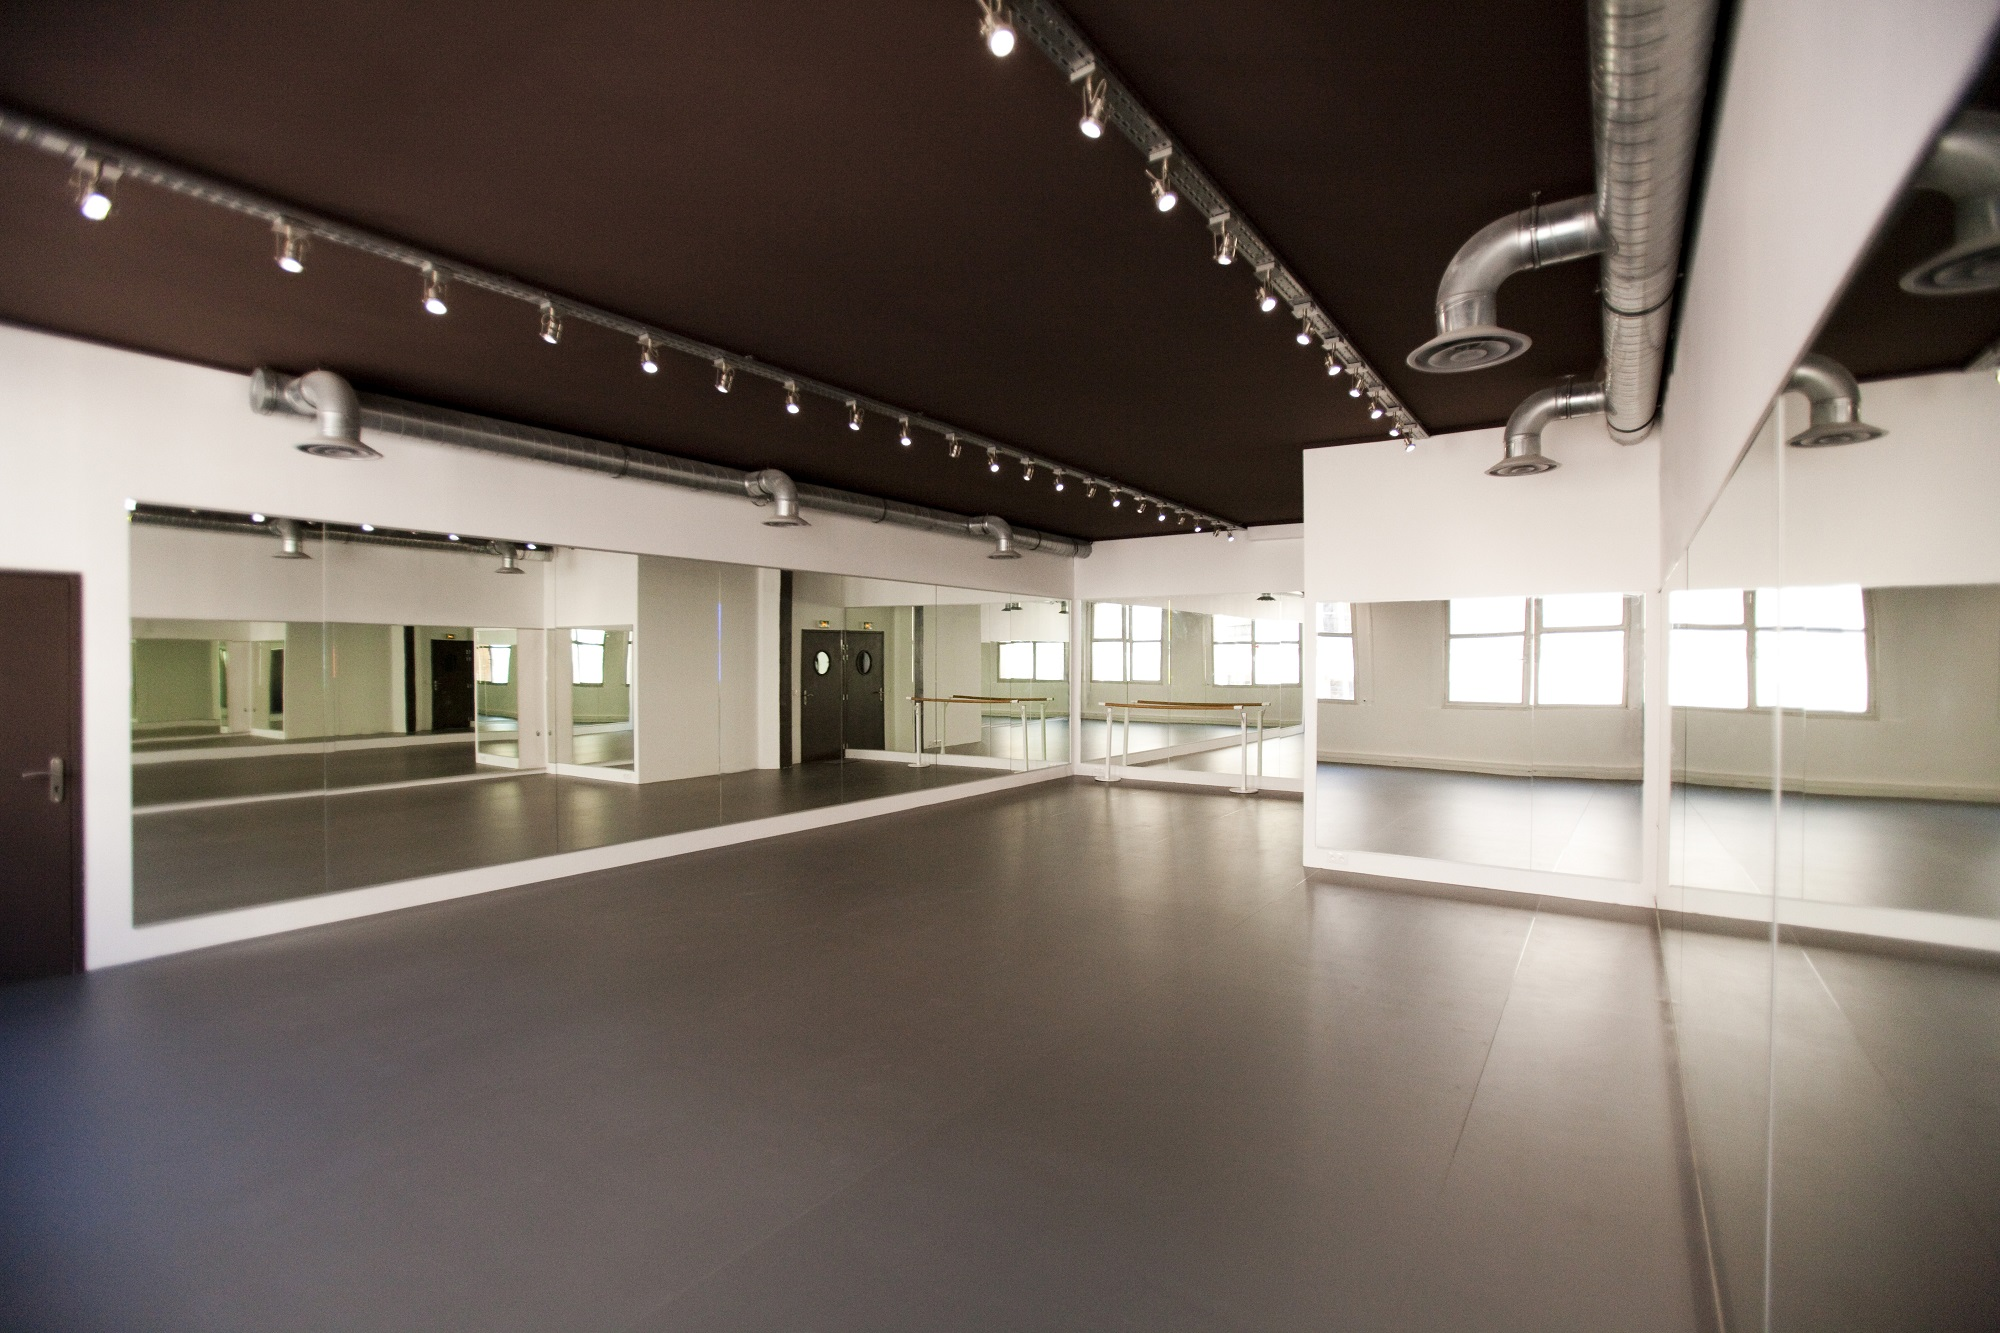 location salle de danse